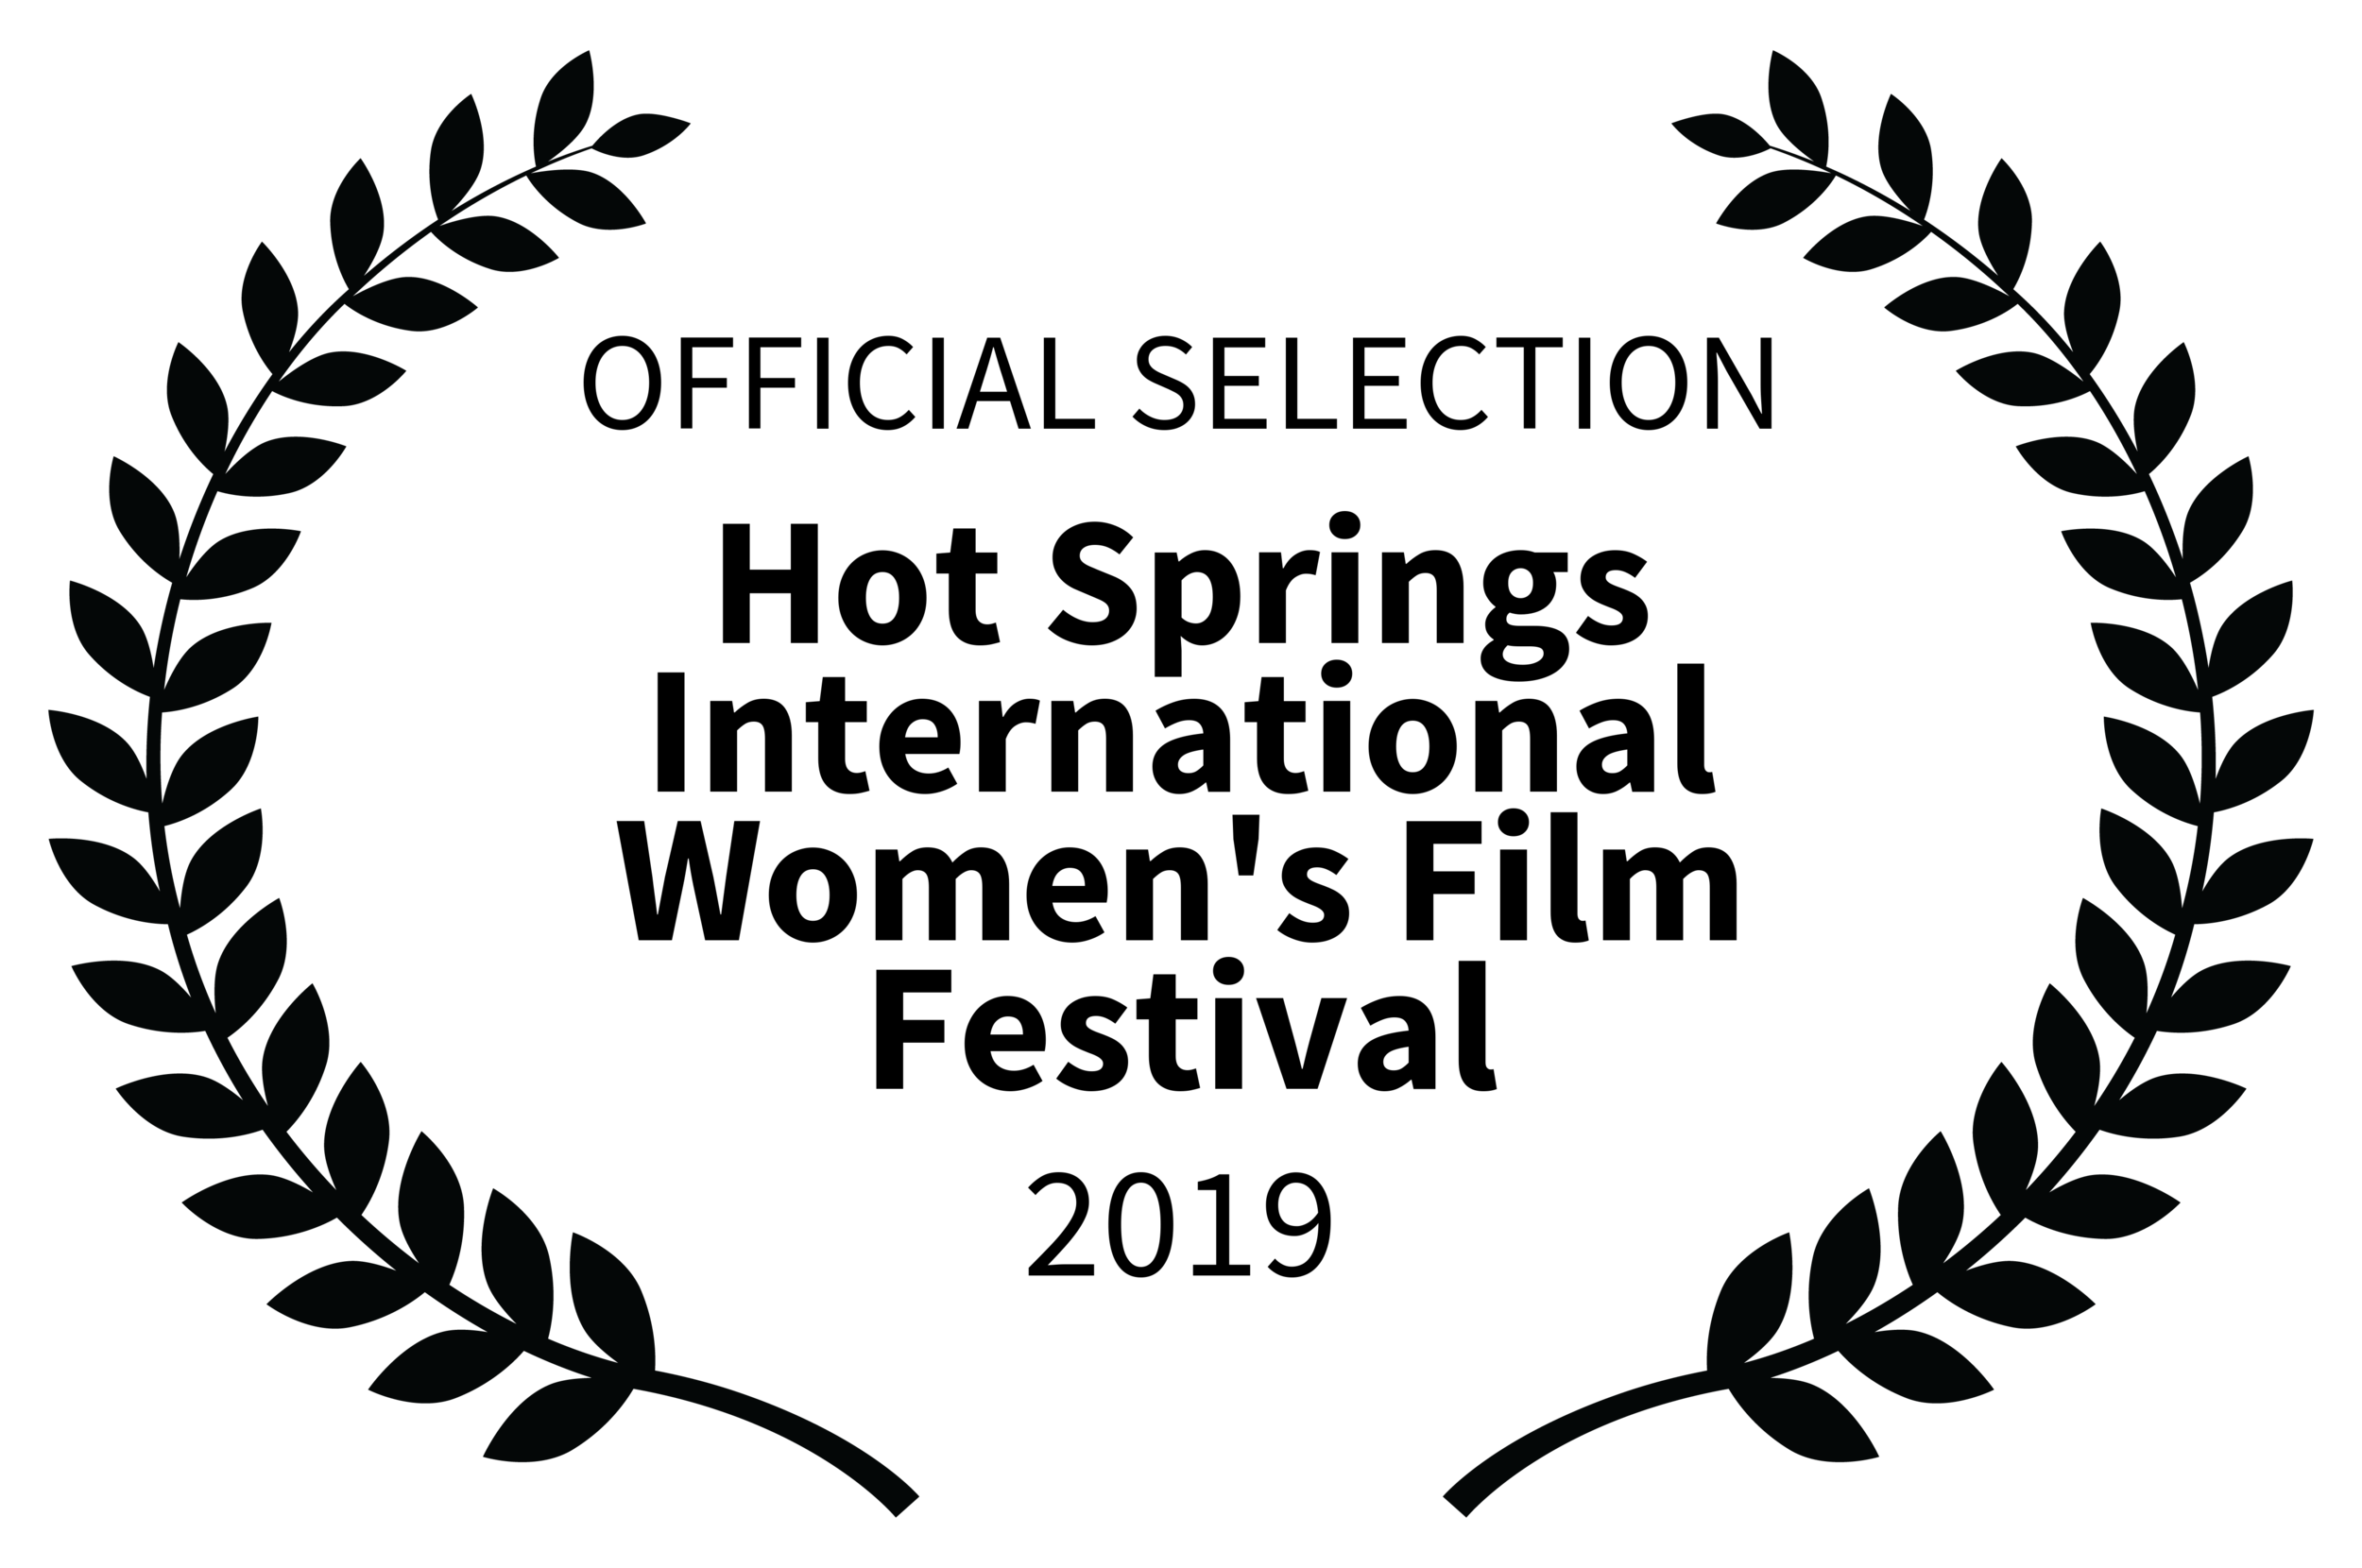 OFFICIALSELECTION-HotSpringsInternationalWomensFilmFestival-2019 (1).png